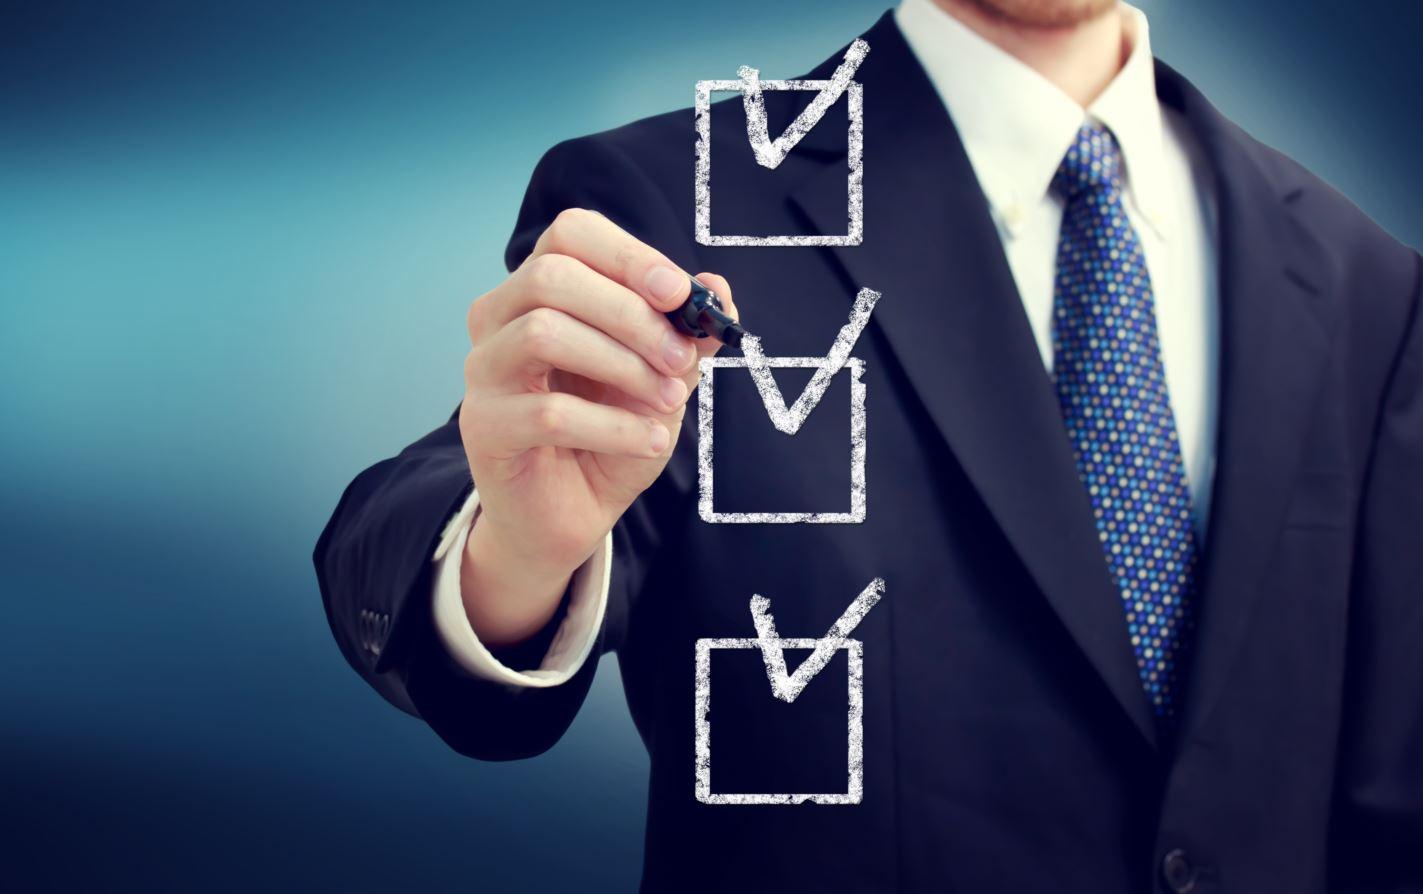 Ways to Streamline Business Procedures